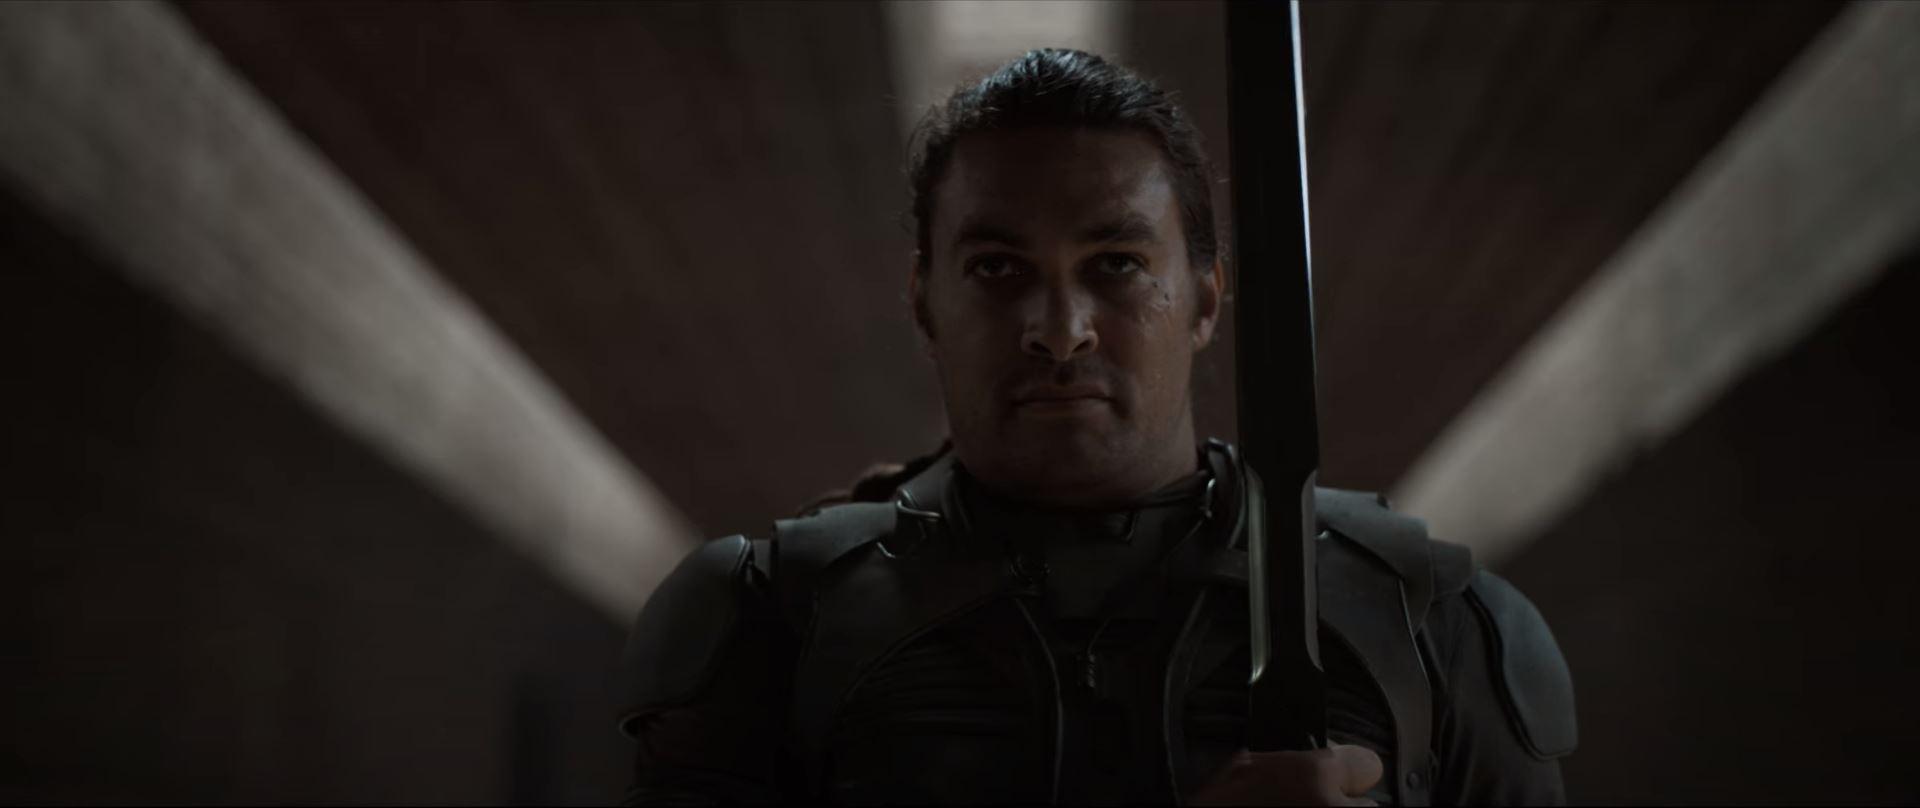 Dune movie trailer Jason Momoa as Duncan Idaho